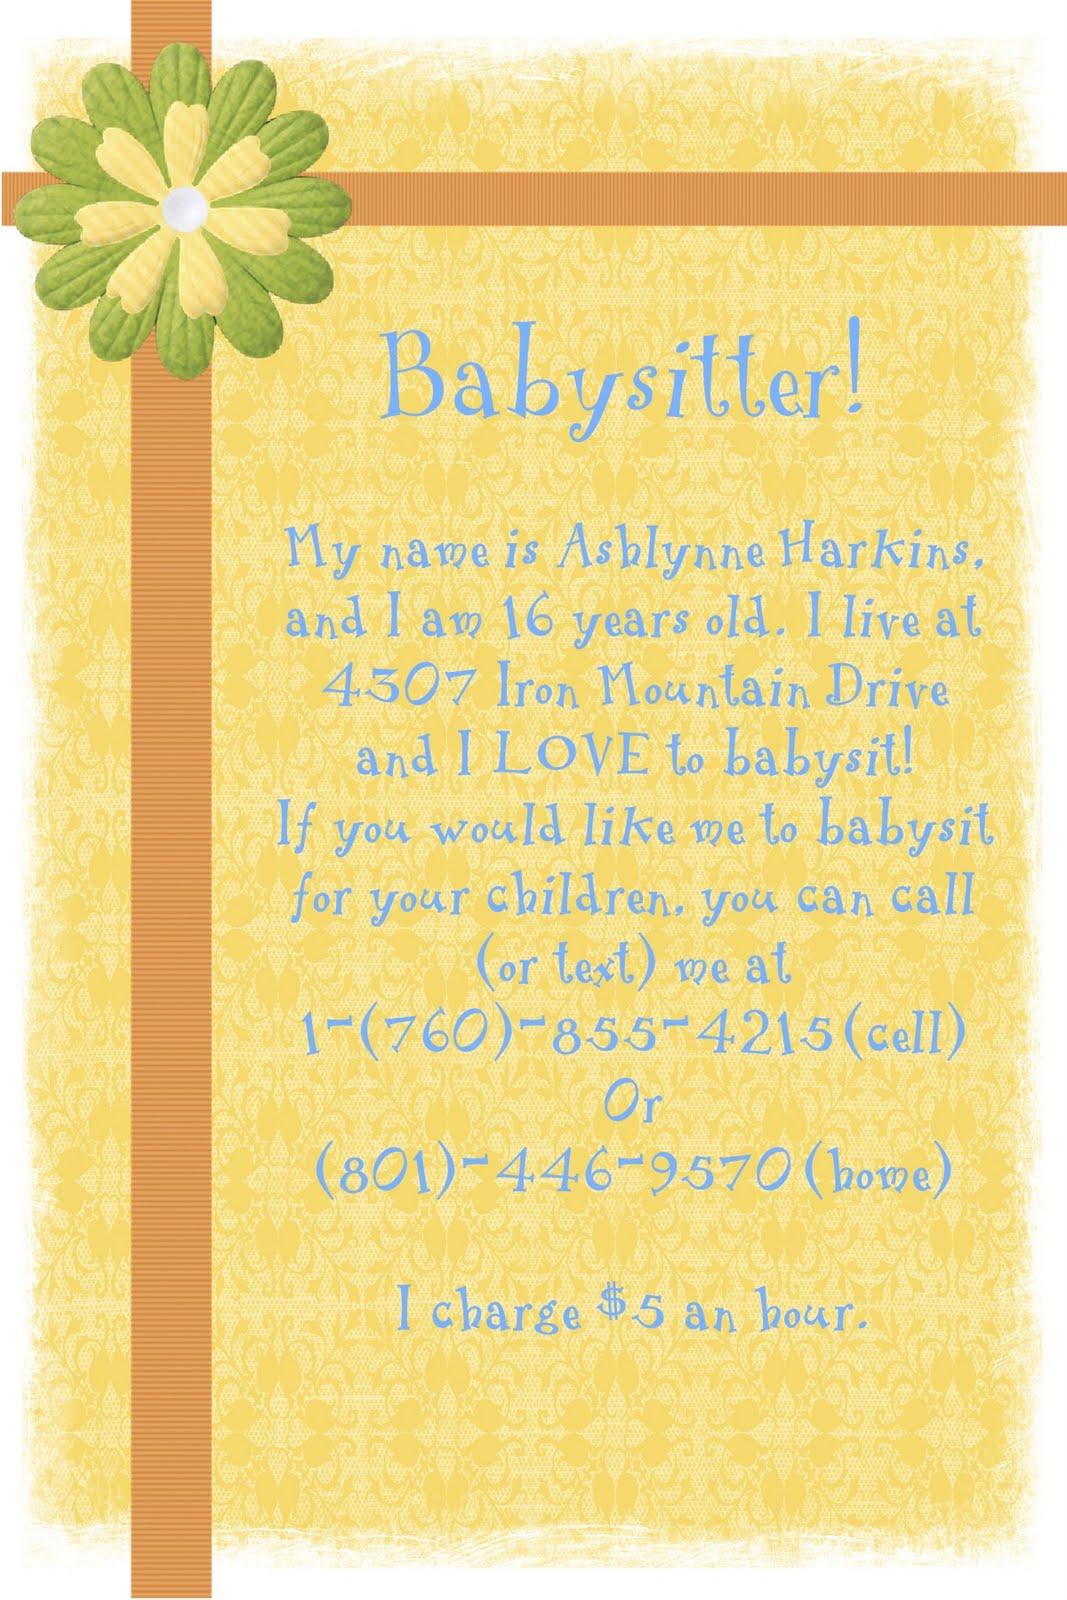 babysitting flier dhavvied cf babysitting flyer template microsoft word